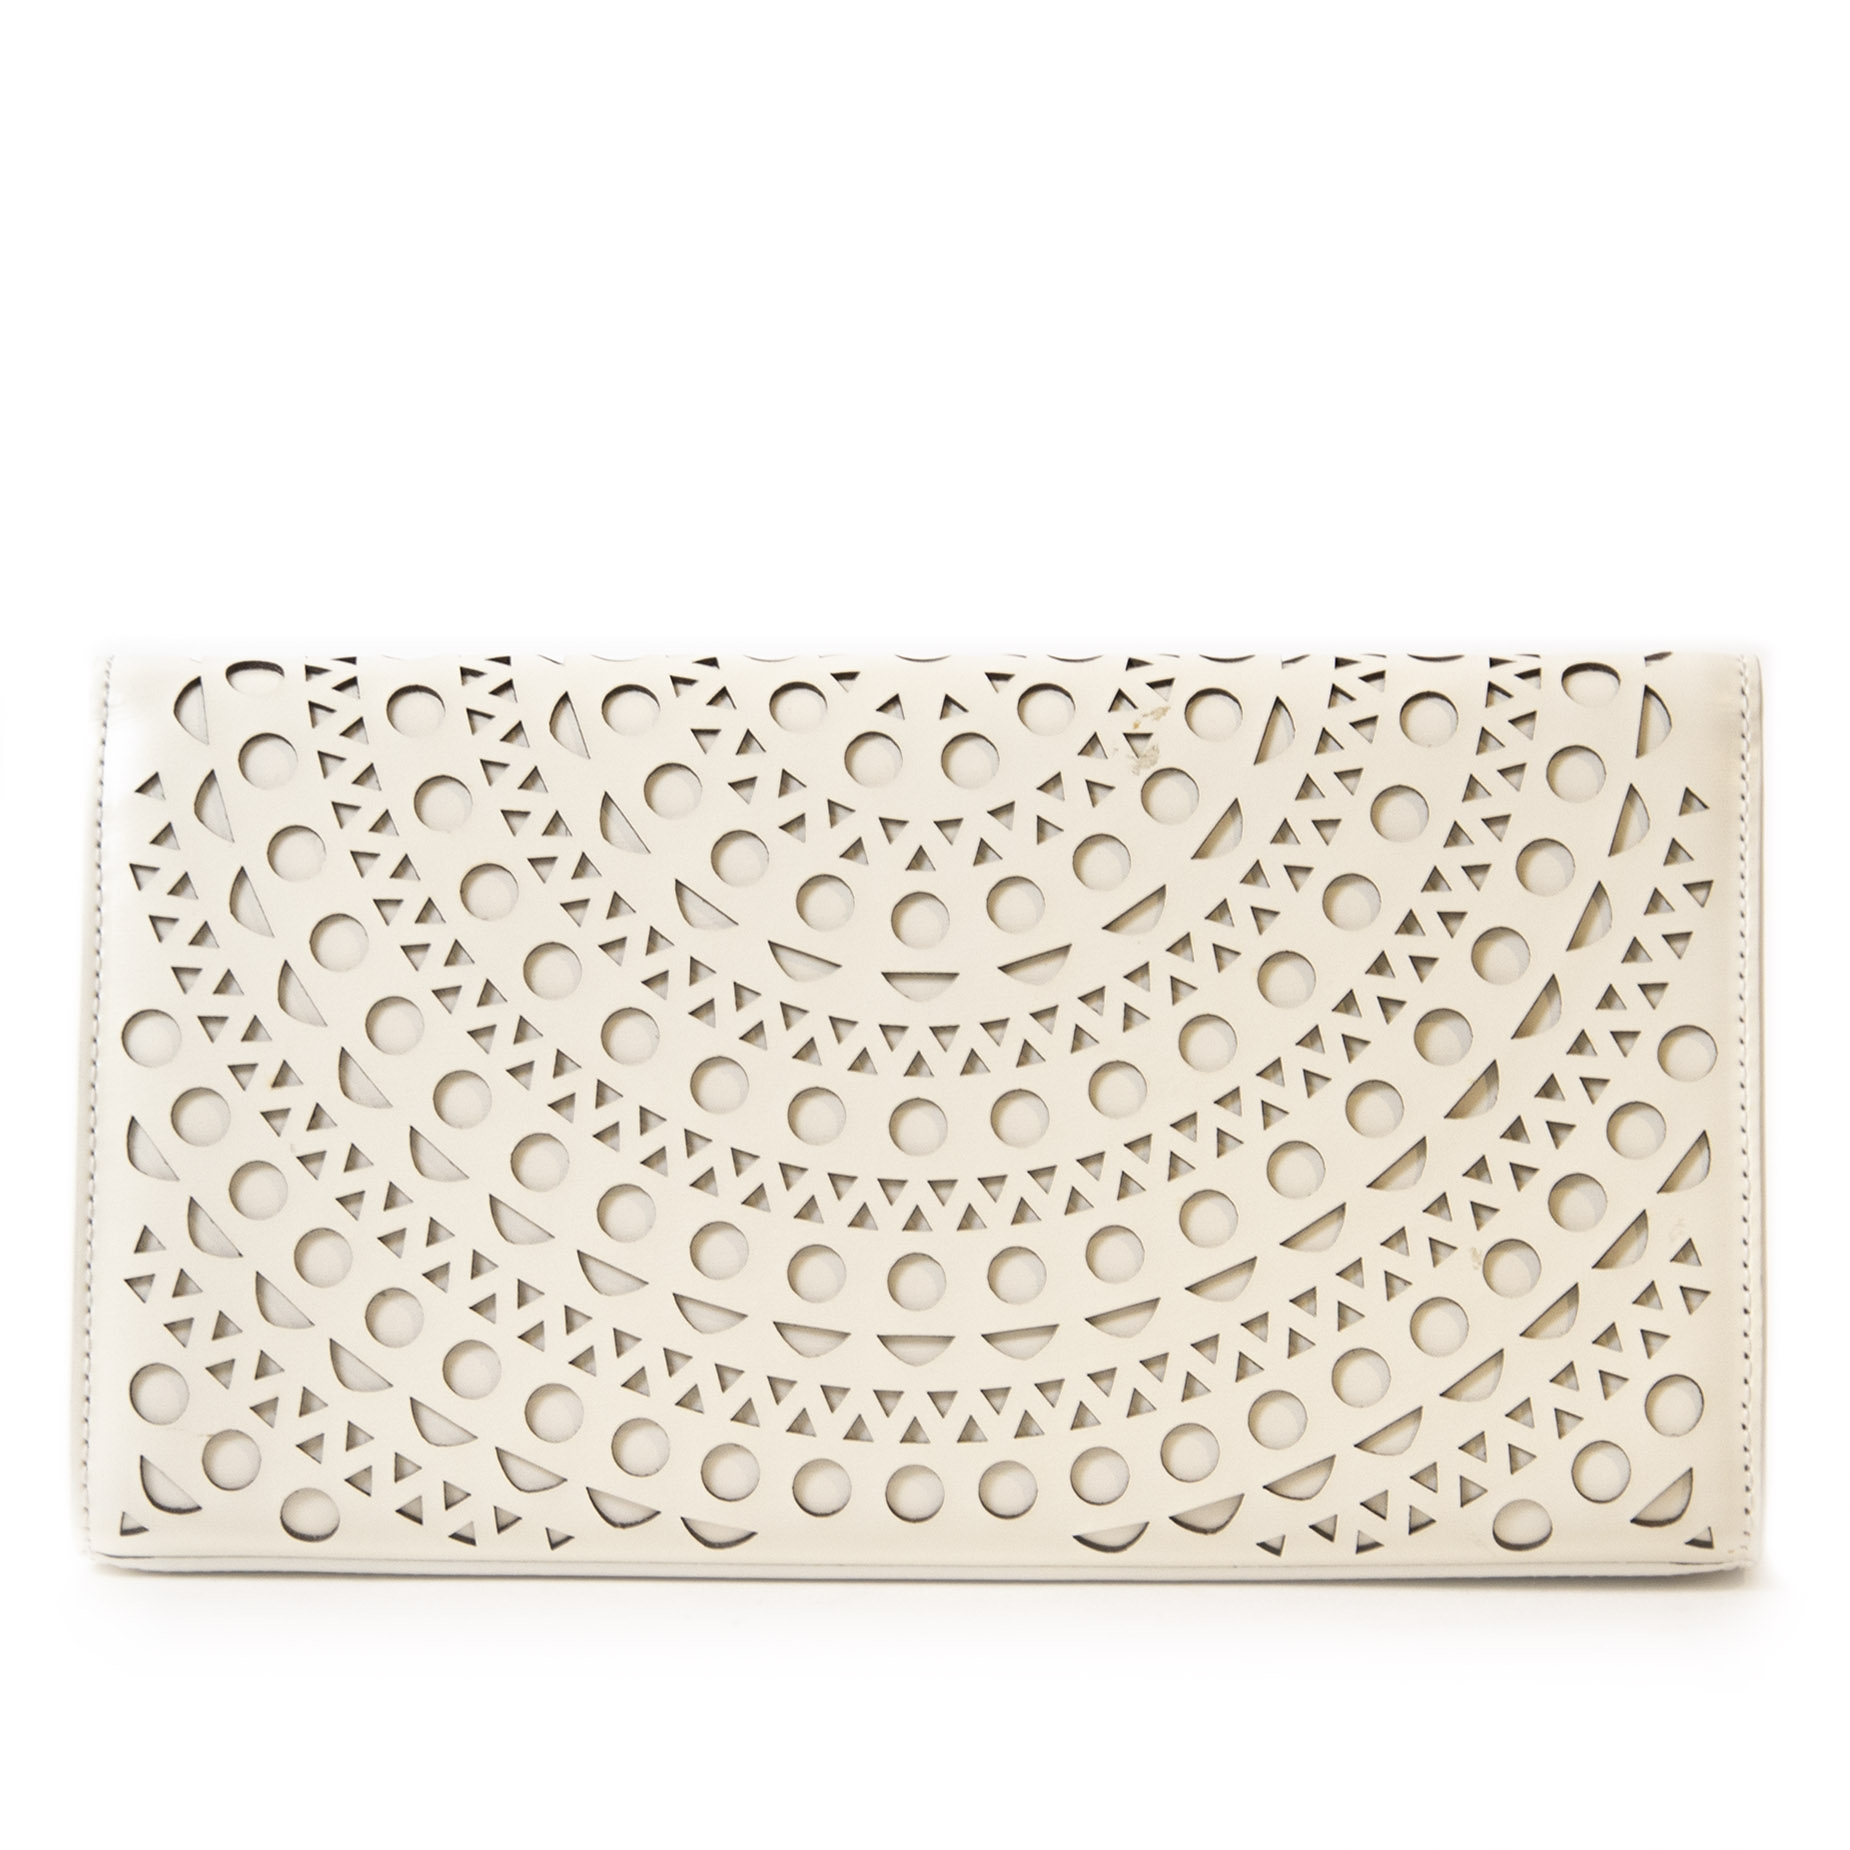 Authentieke tweedehands vintage Alaïa White Clutch Bag koop online webshop LabelLOV